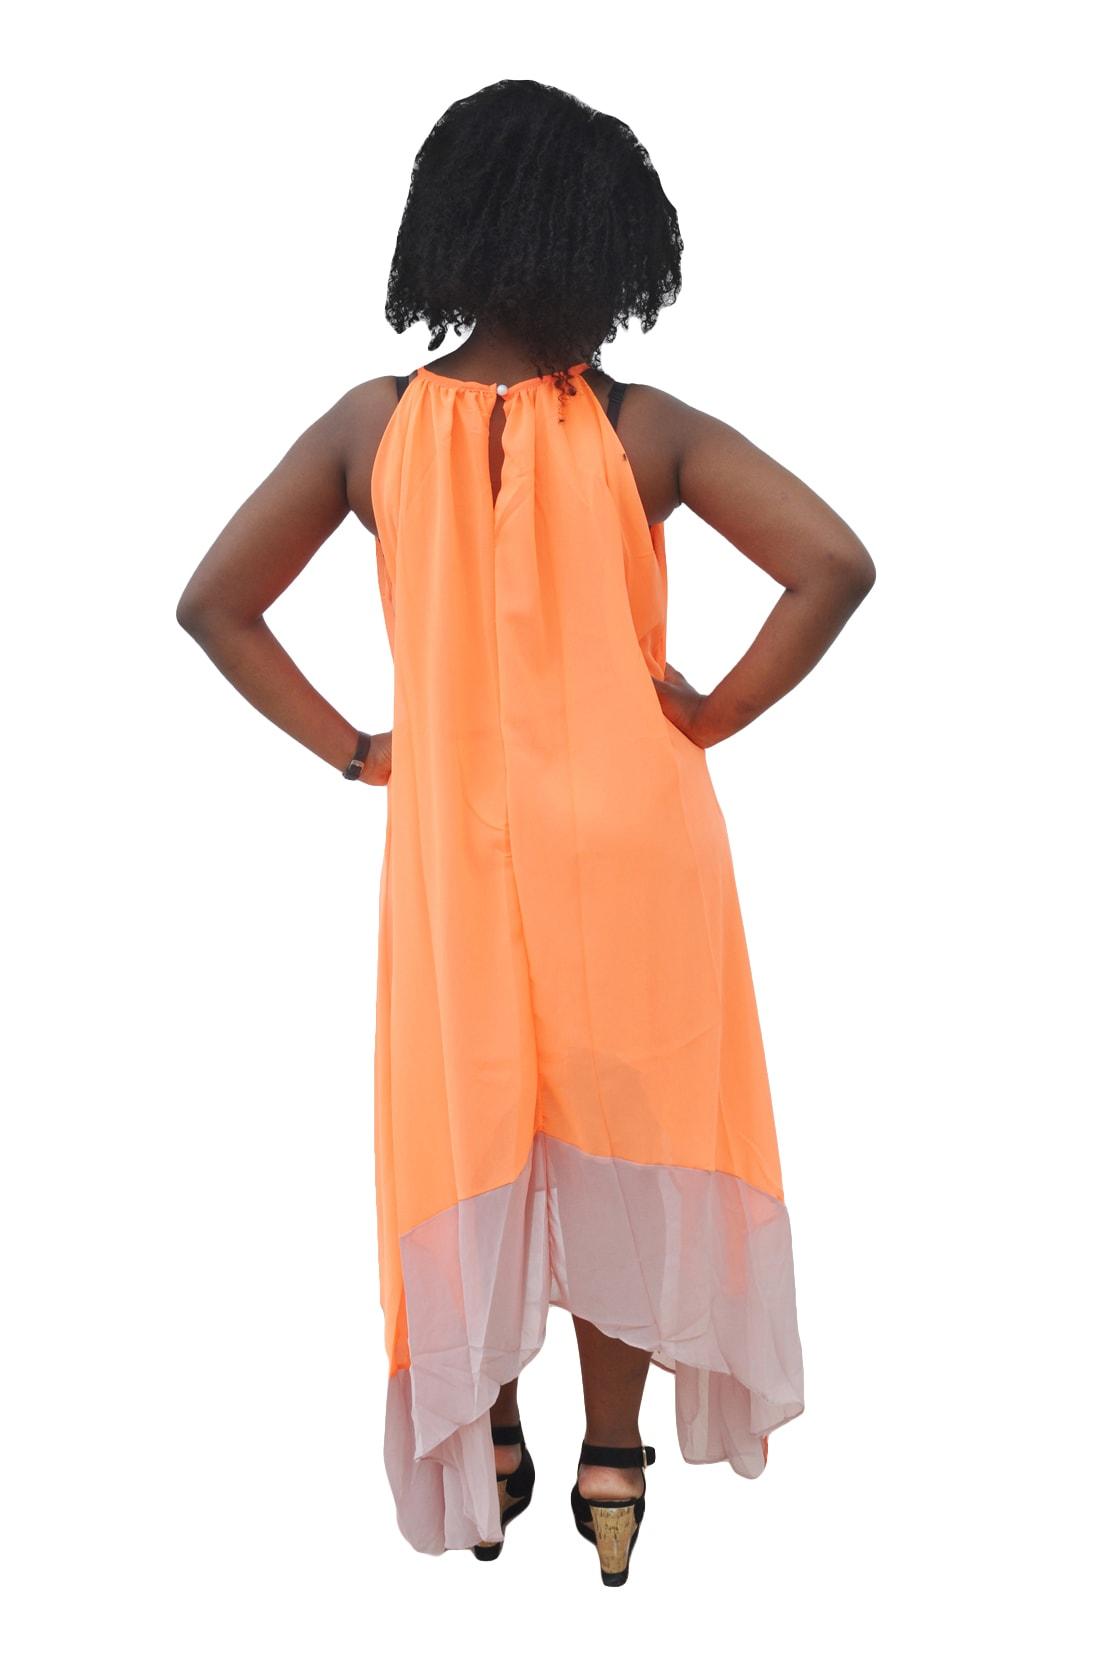 M0279 orange3 High Low Dresses maureens.com boutique